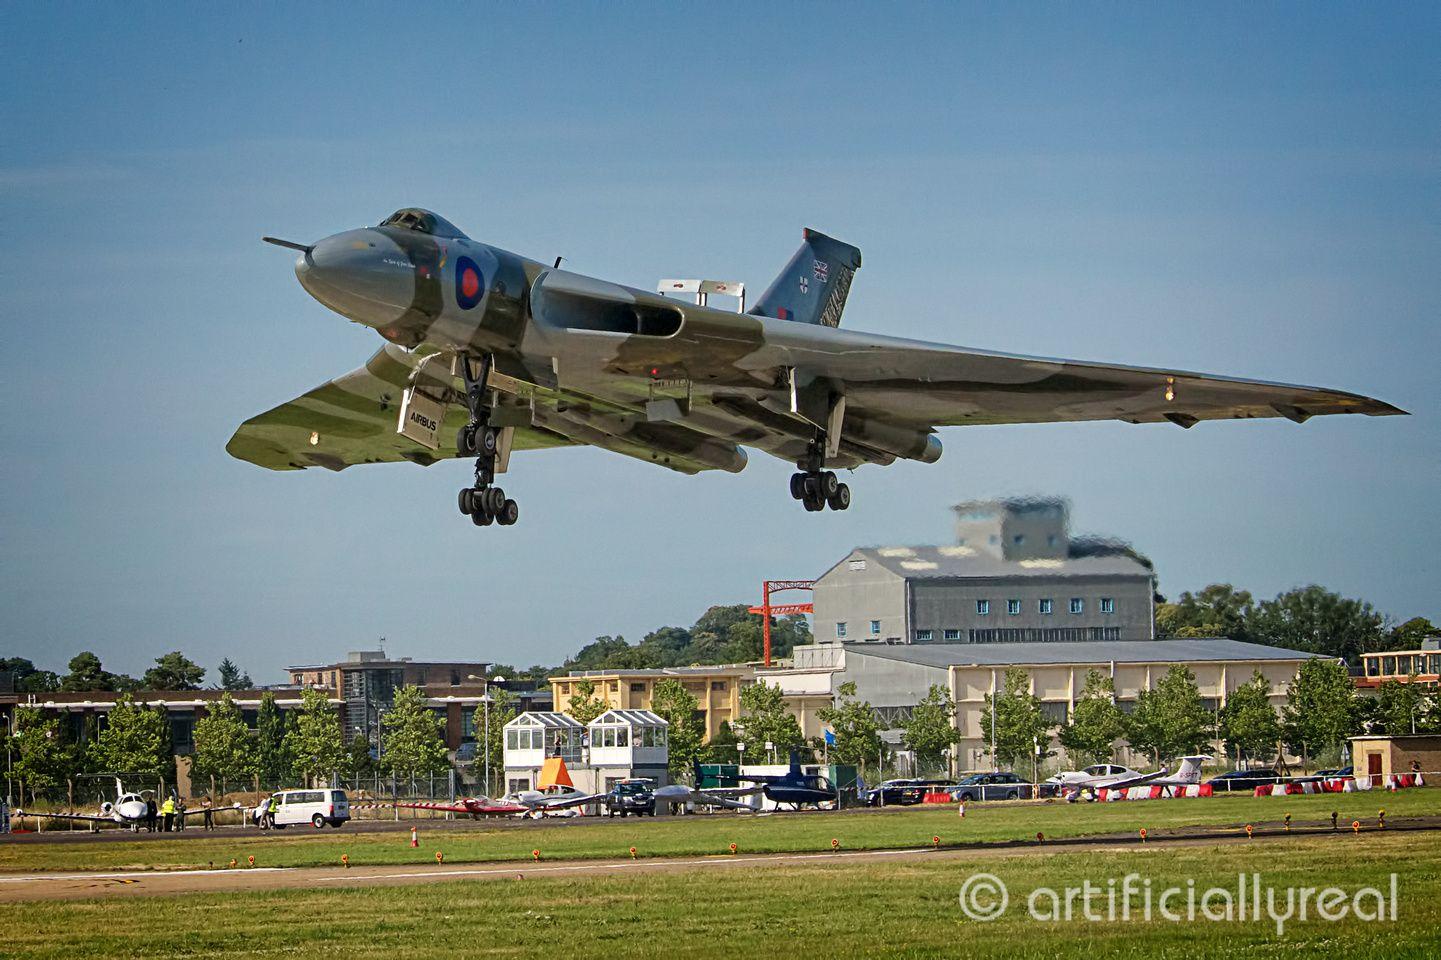 Avro Vulcan landing at Farnborough